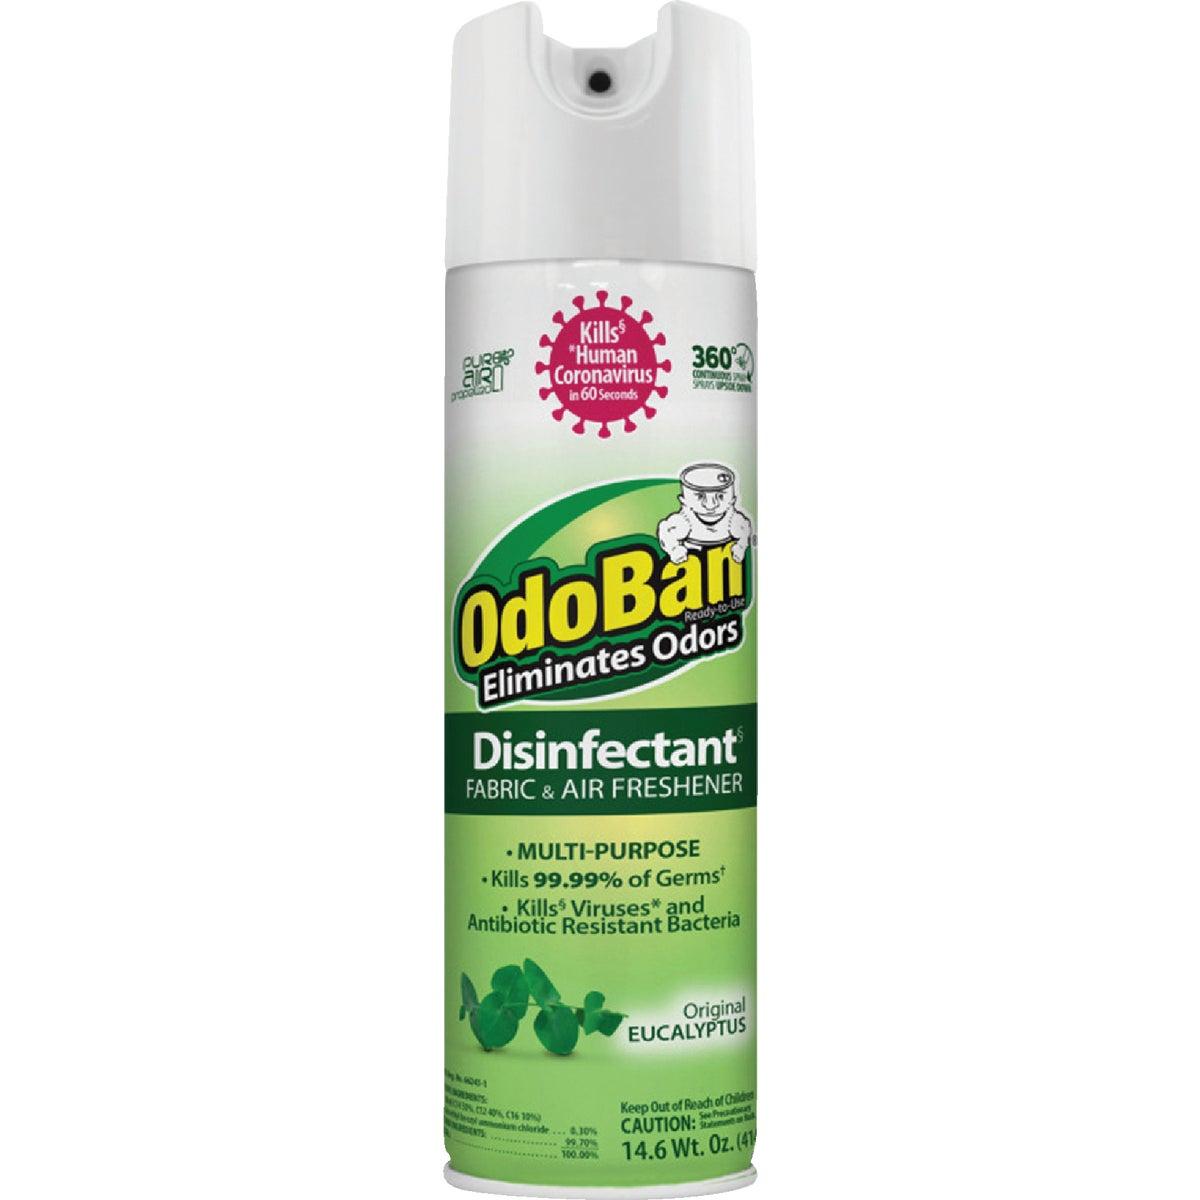 14Oz Fbrc/Air Dsnfectant